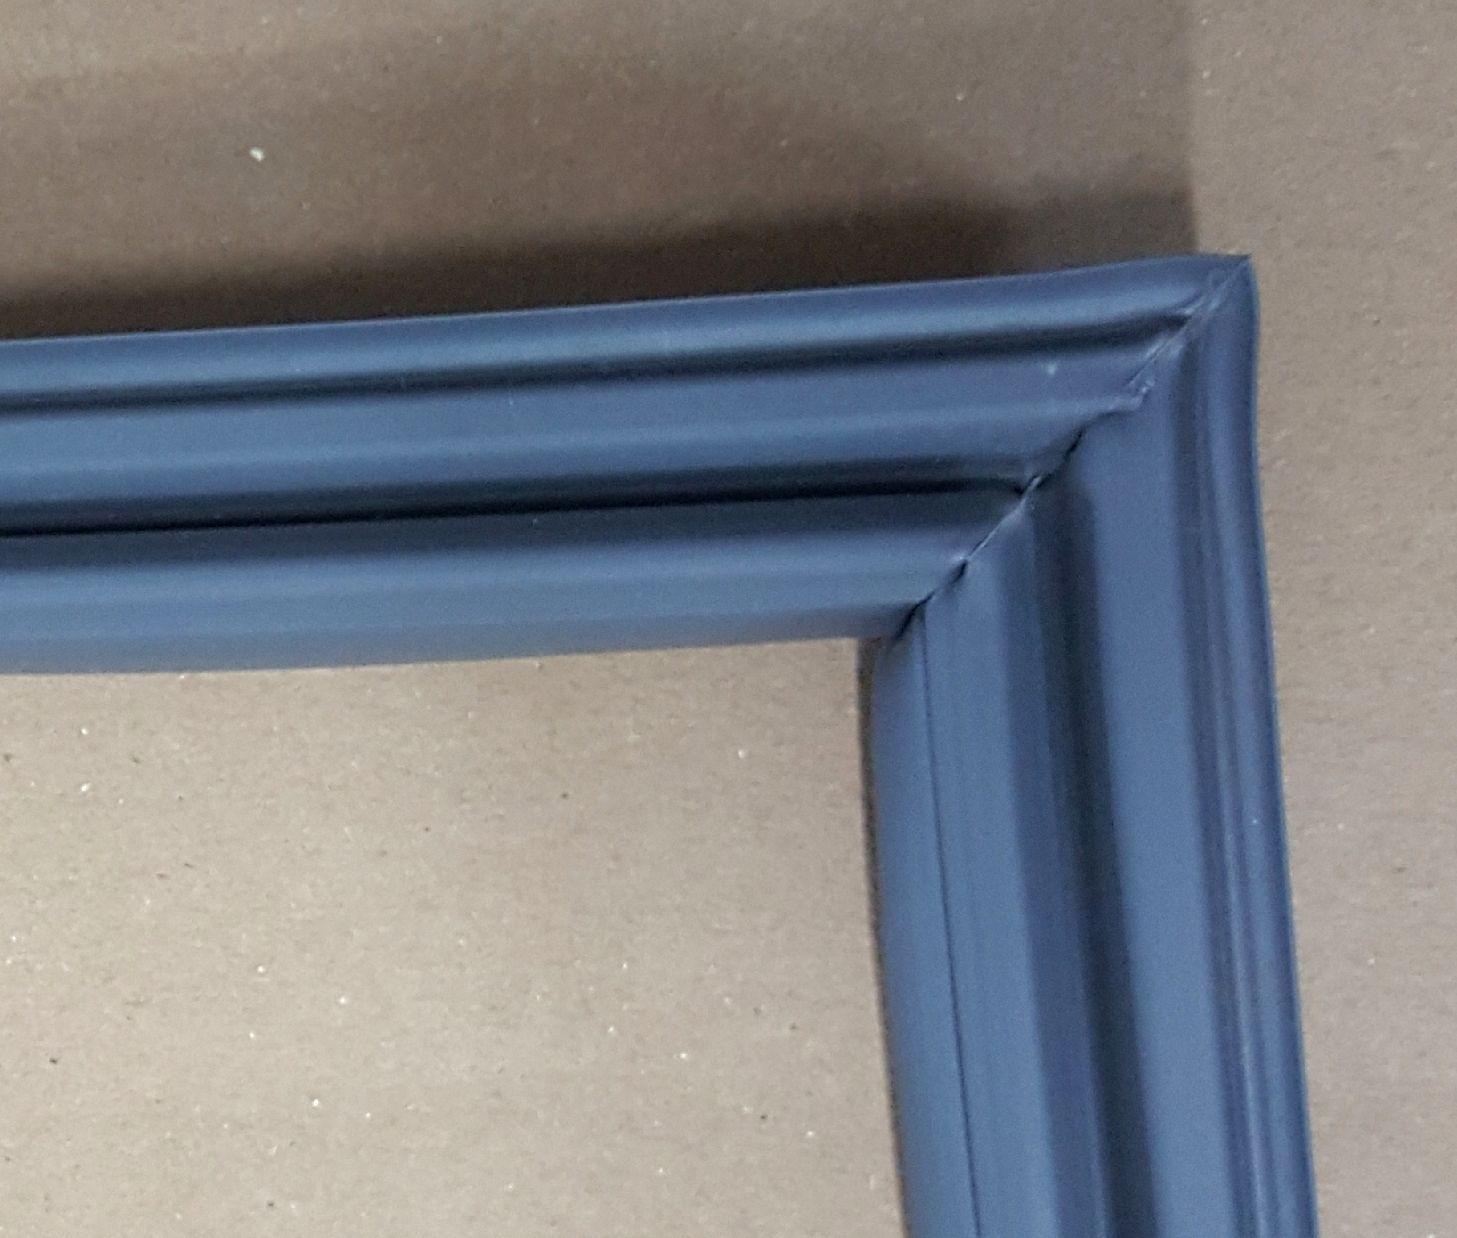 Borracha de Freezer Metalfrio DA550 Medidas 61 x 82 cm - Encaixe na Tampa ** CONFIRA AS MEDIDAS **